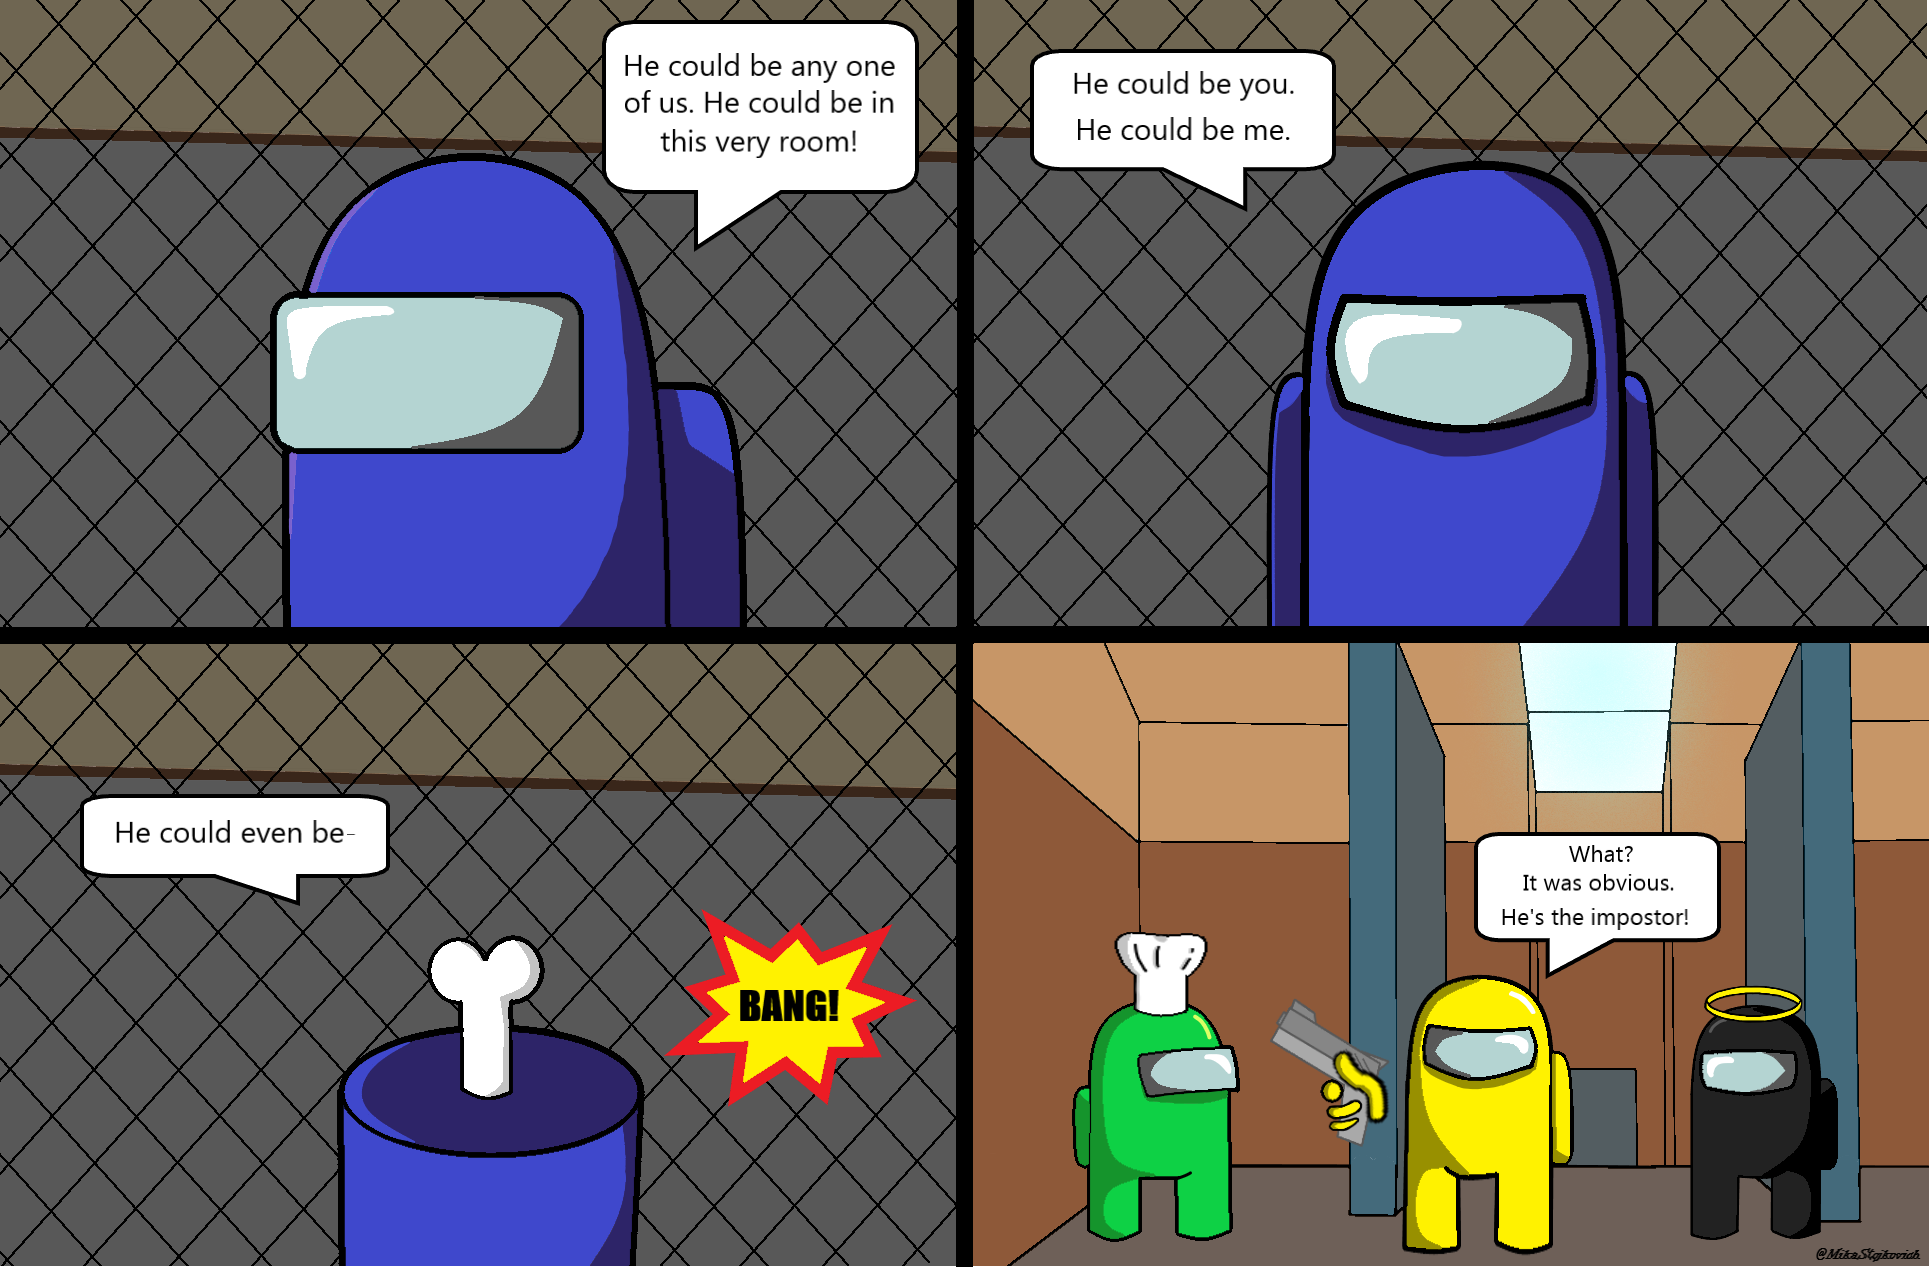 Meet The Impostor Full Comic Among Us Really Funny Memes Stupid Funny Memes Funny Memes